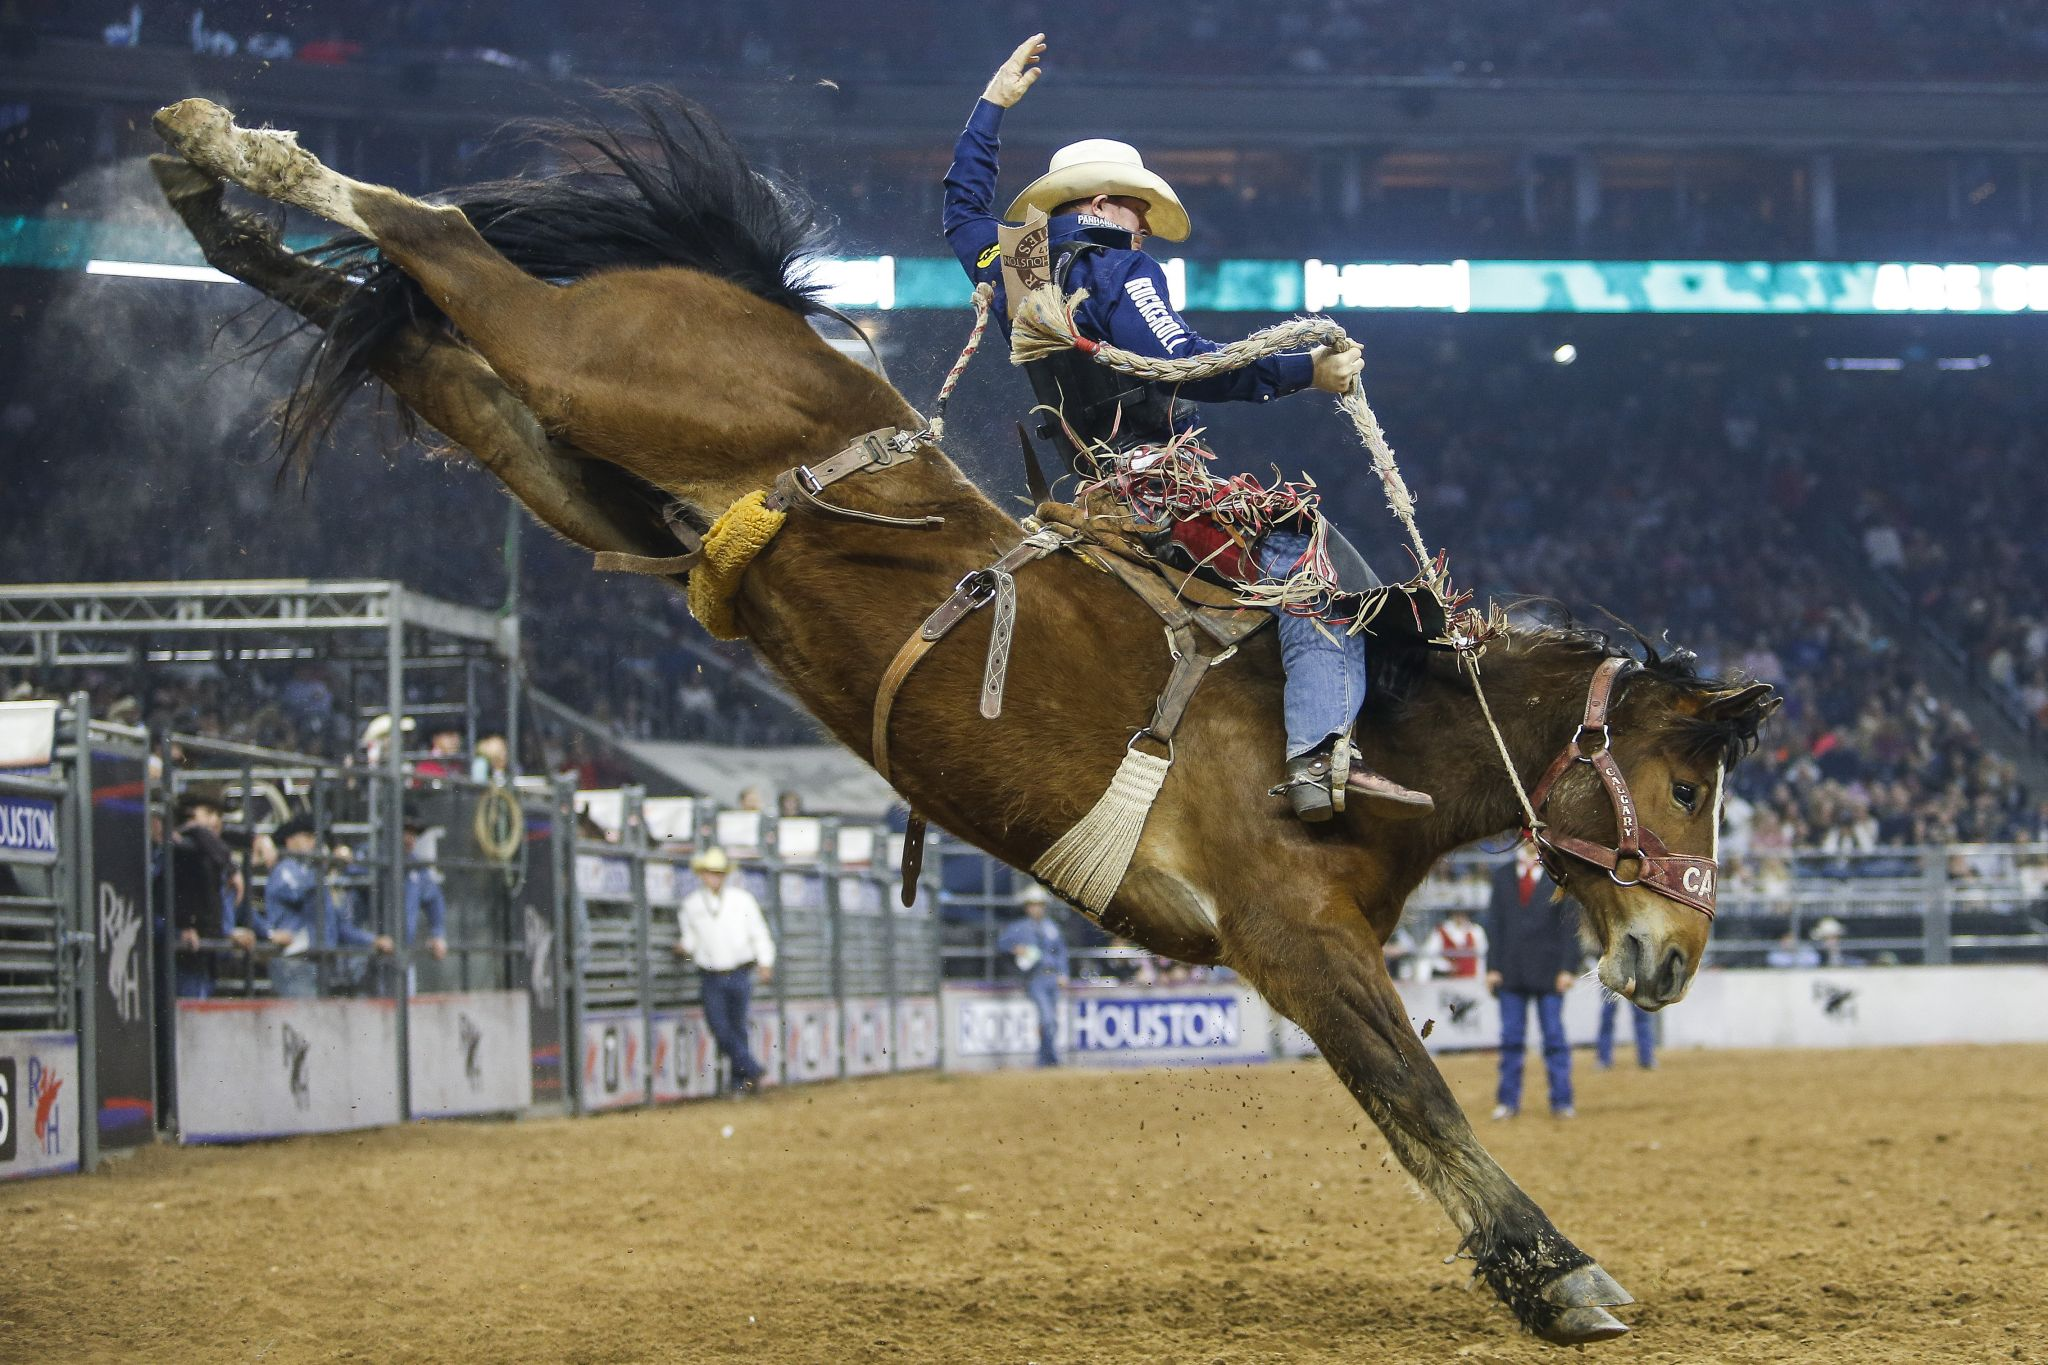 Saddle Bronc Rider Jacobs Crawley Wins Super Series Iii At